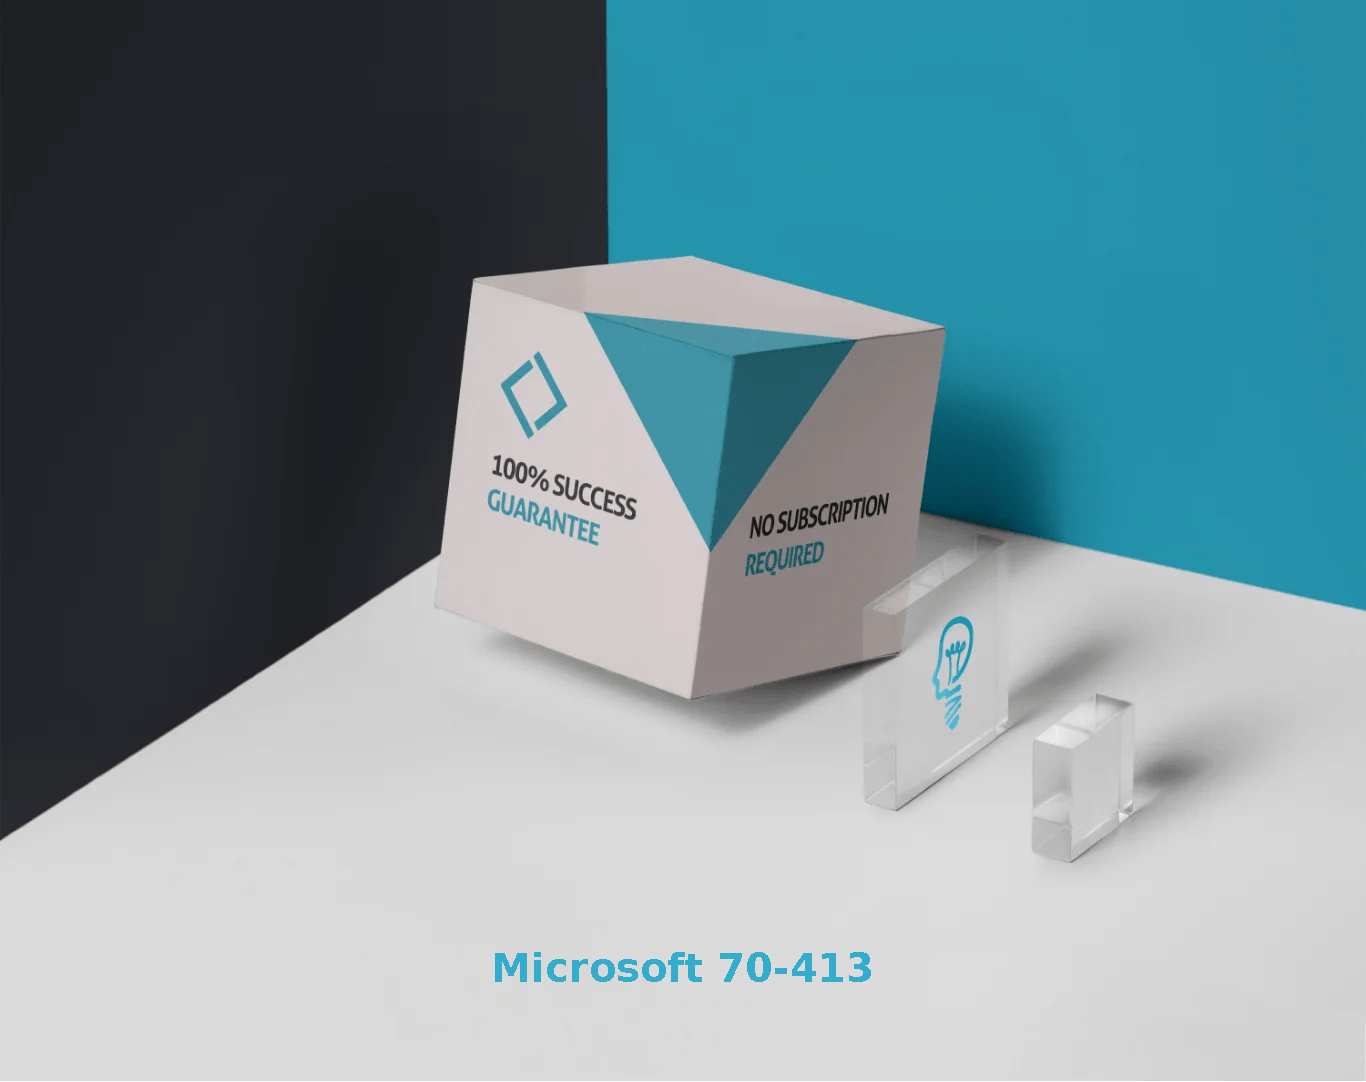 Microsoft 70-413 Exams